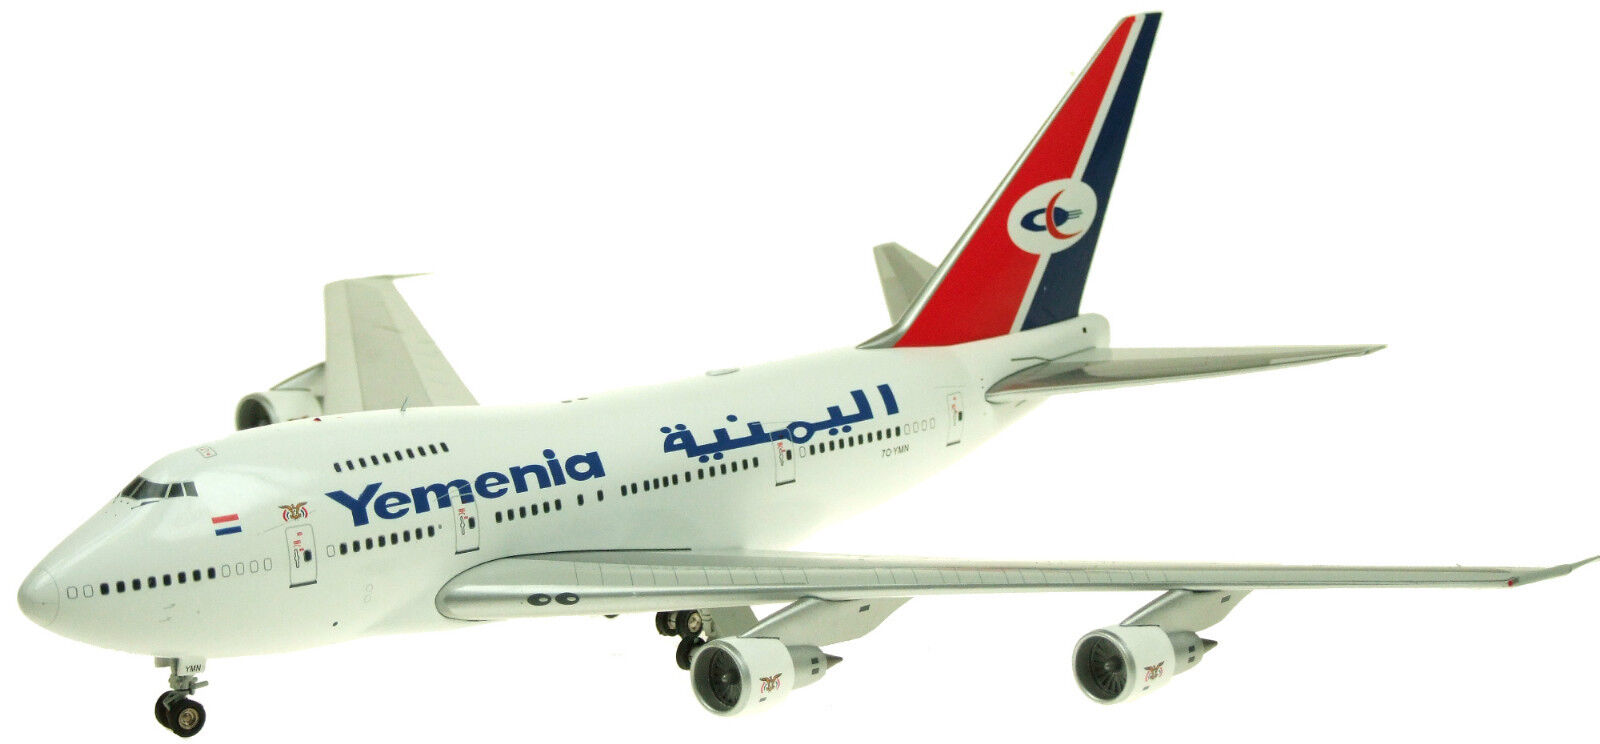 INFLIGHT 200 IF747SP0914 1 200 YEMEN AIRWAYS 747SP-27 7O-YMN